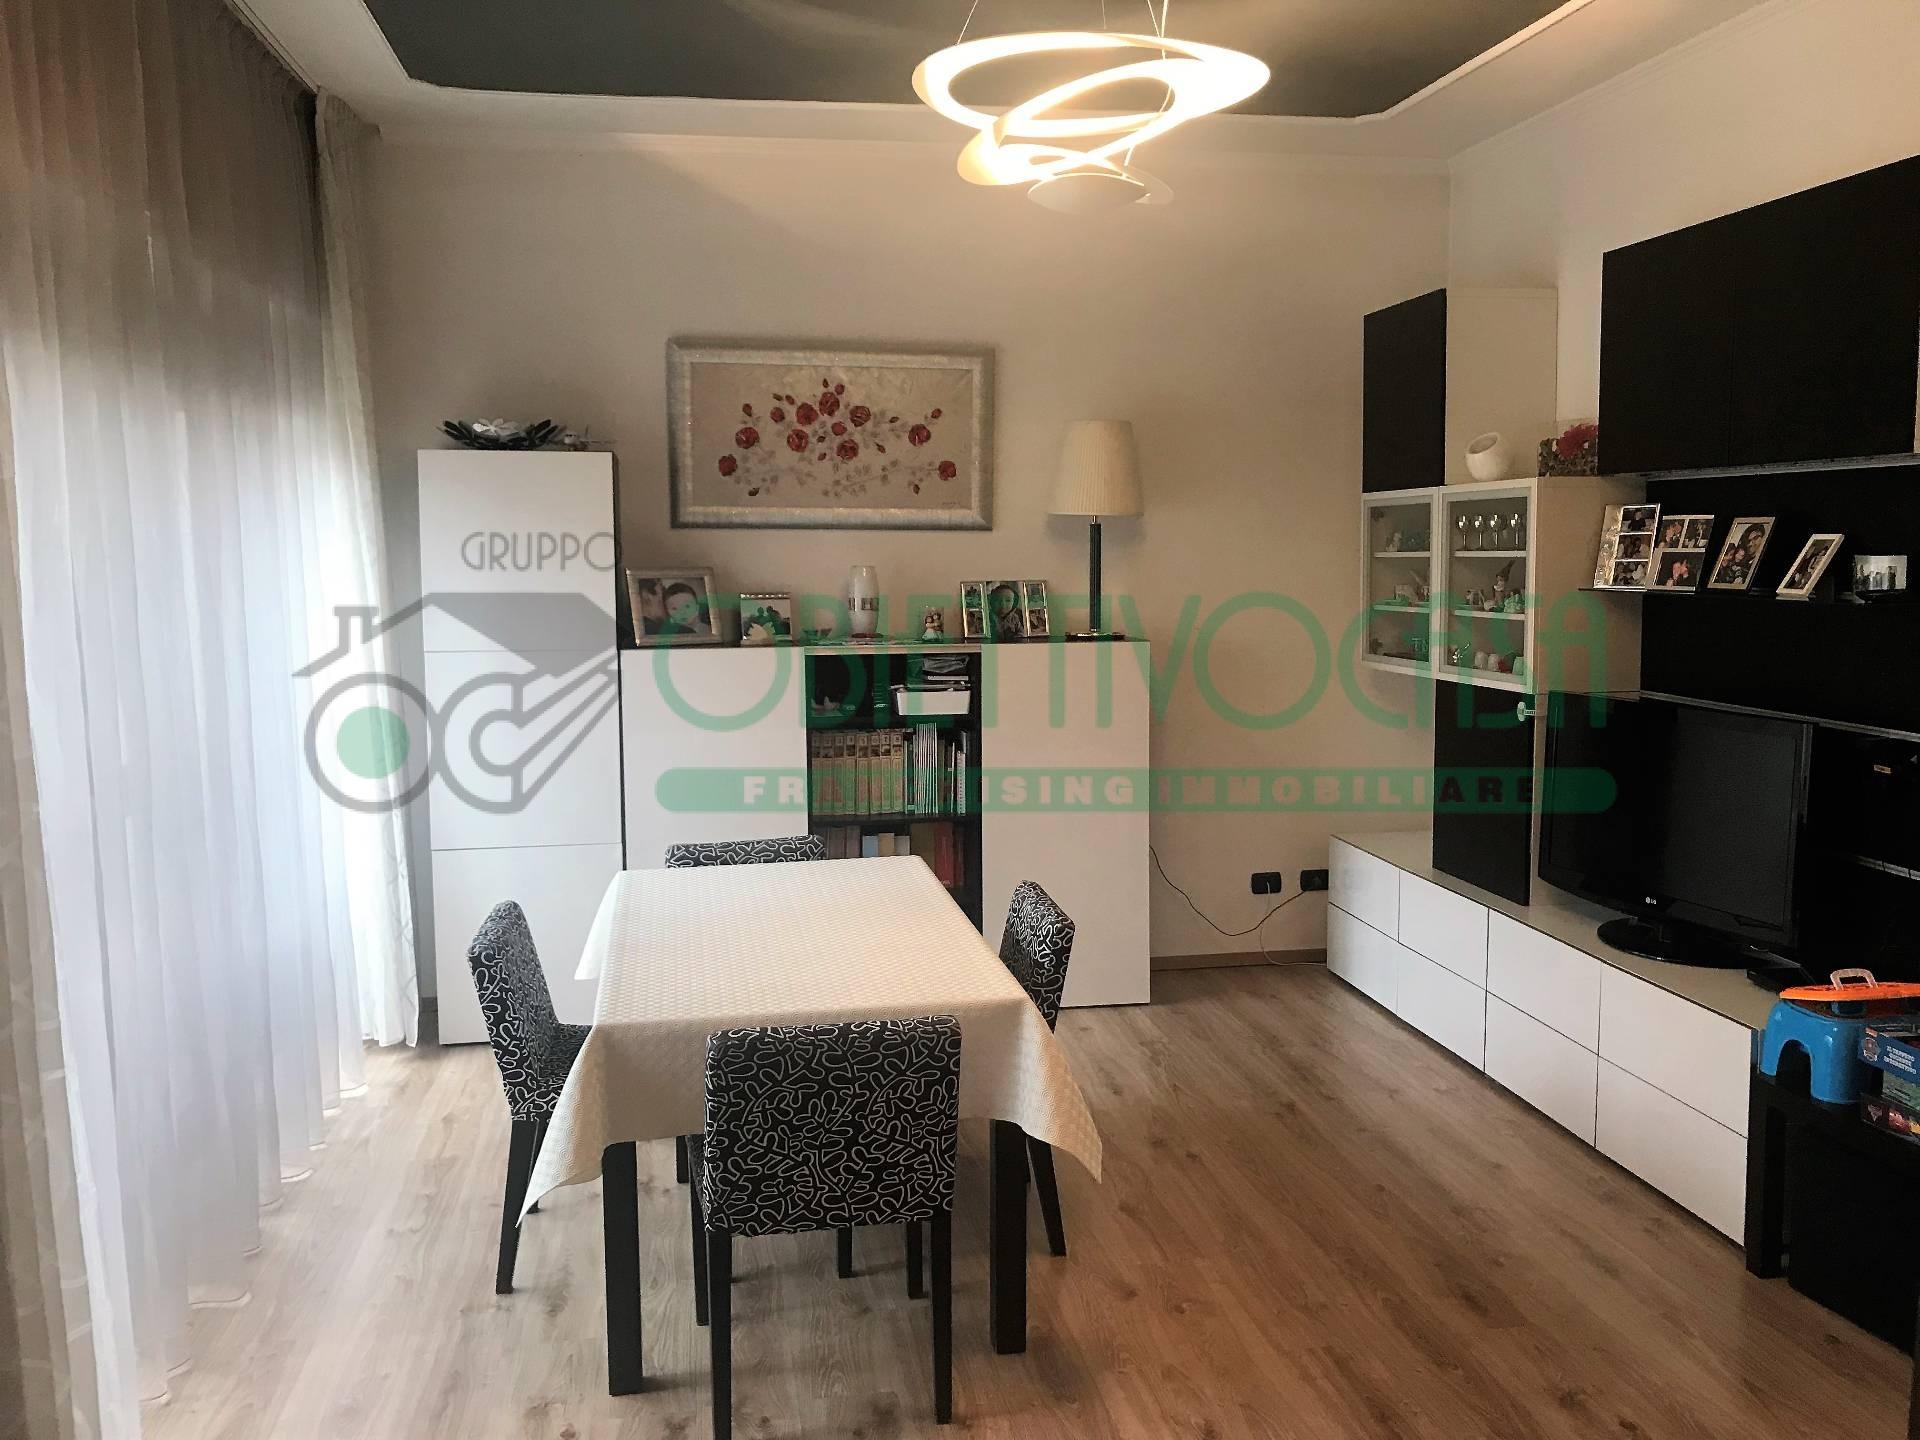 Buccinasco | Appartamento in Vendita in  | lacasadimilano.it